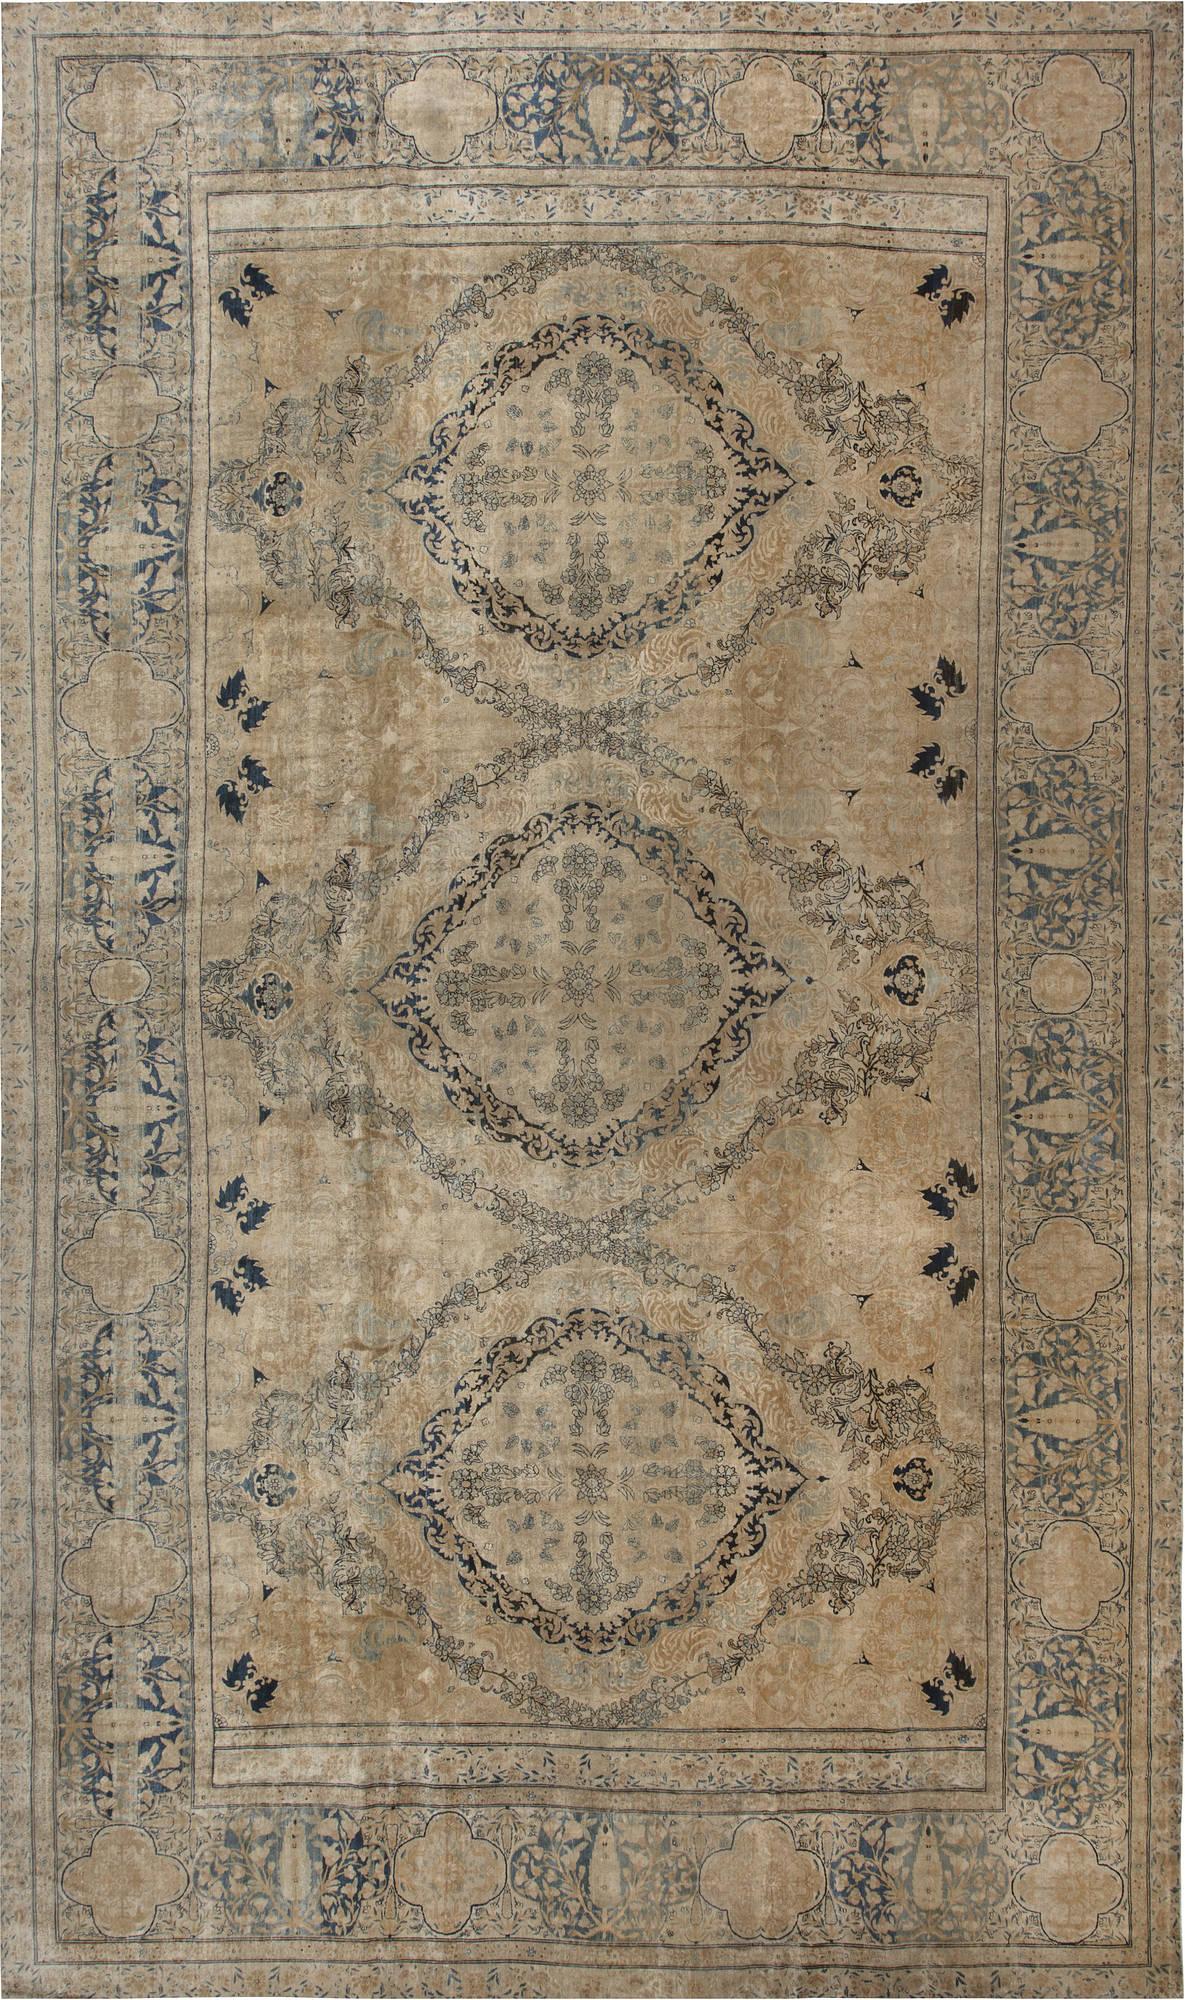 Antique Persian Kirman Carpet BB6717